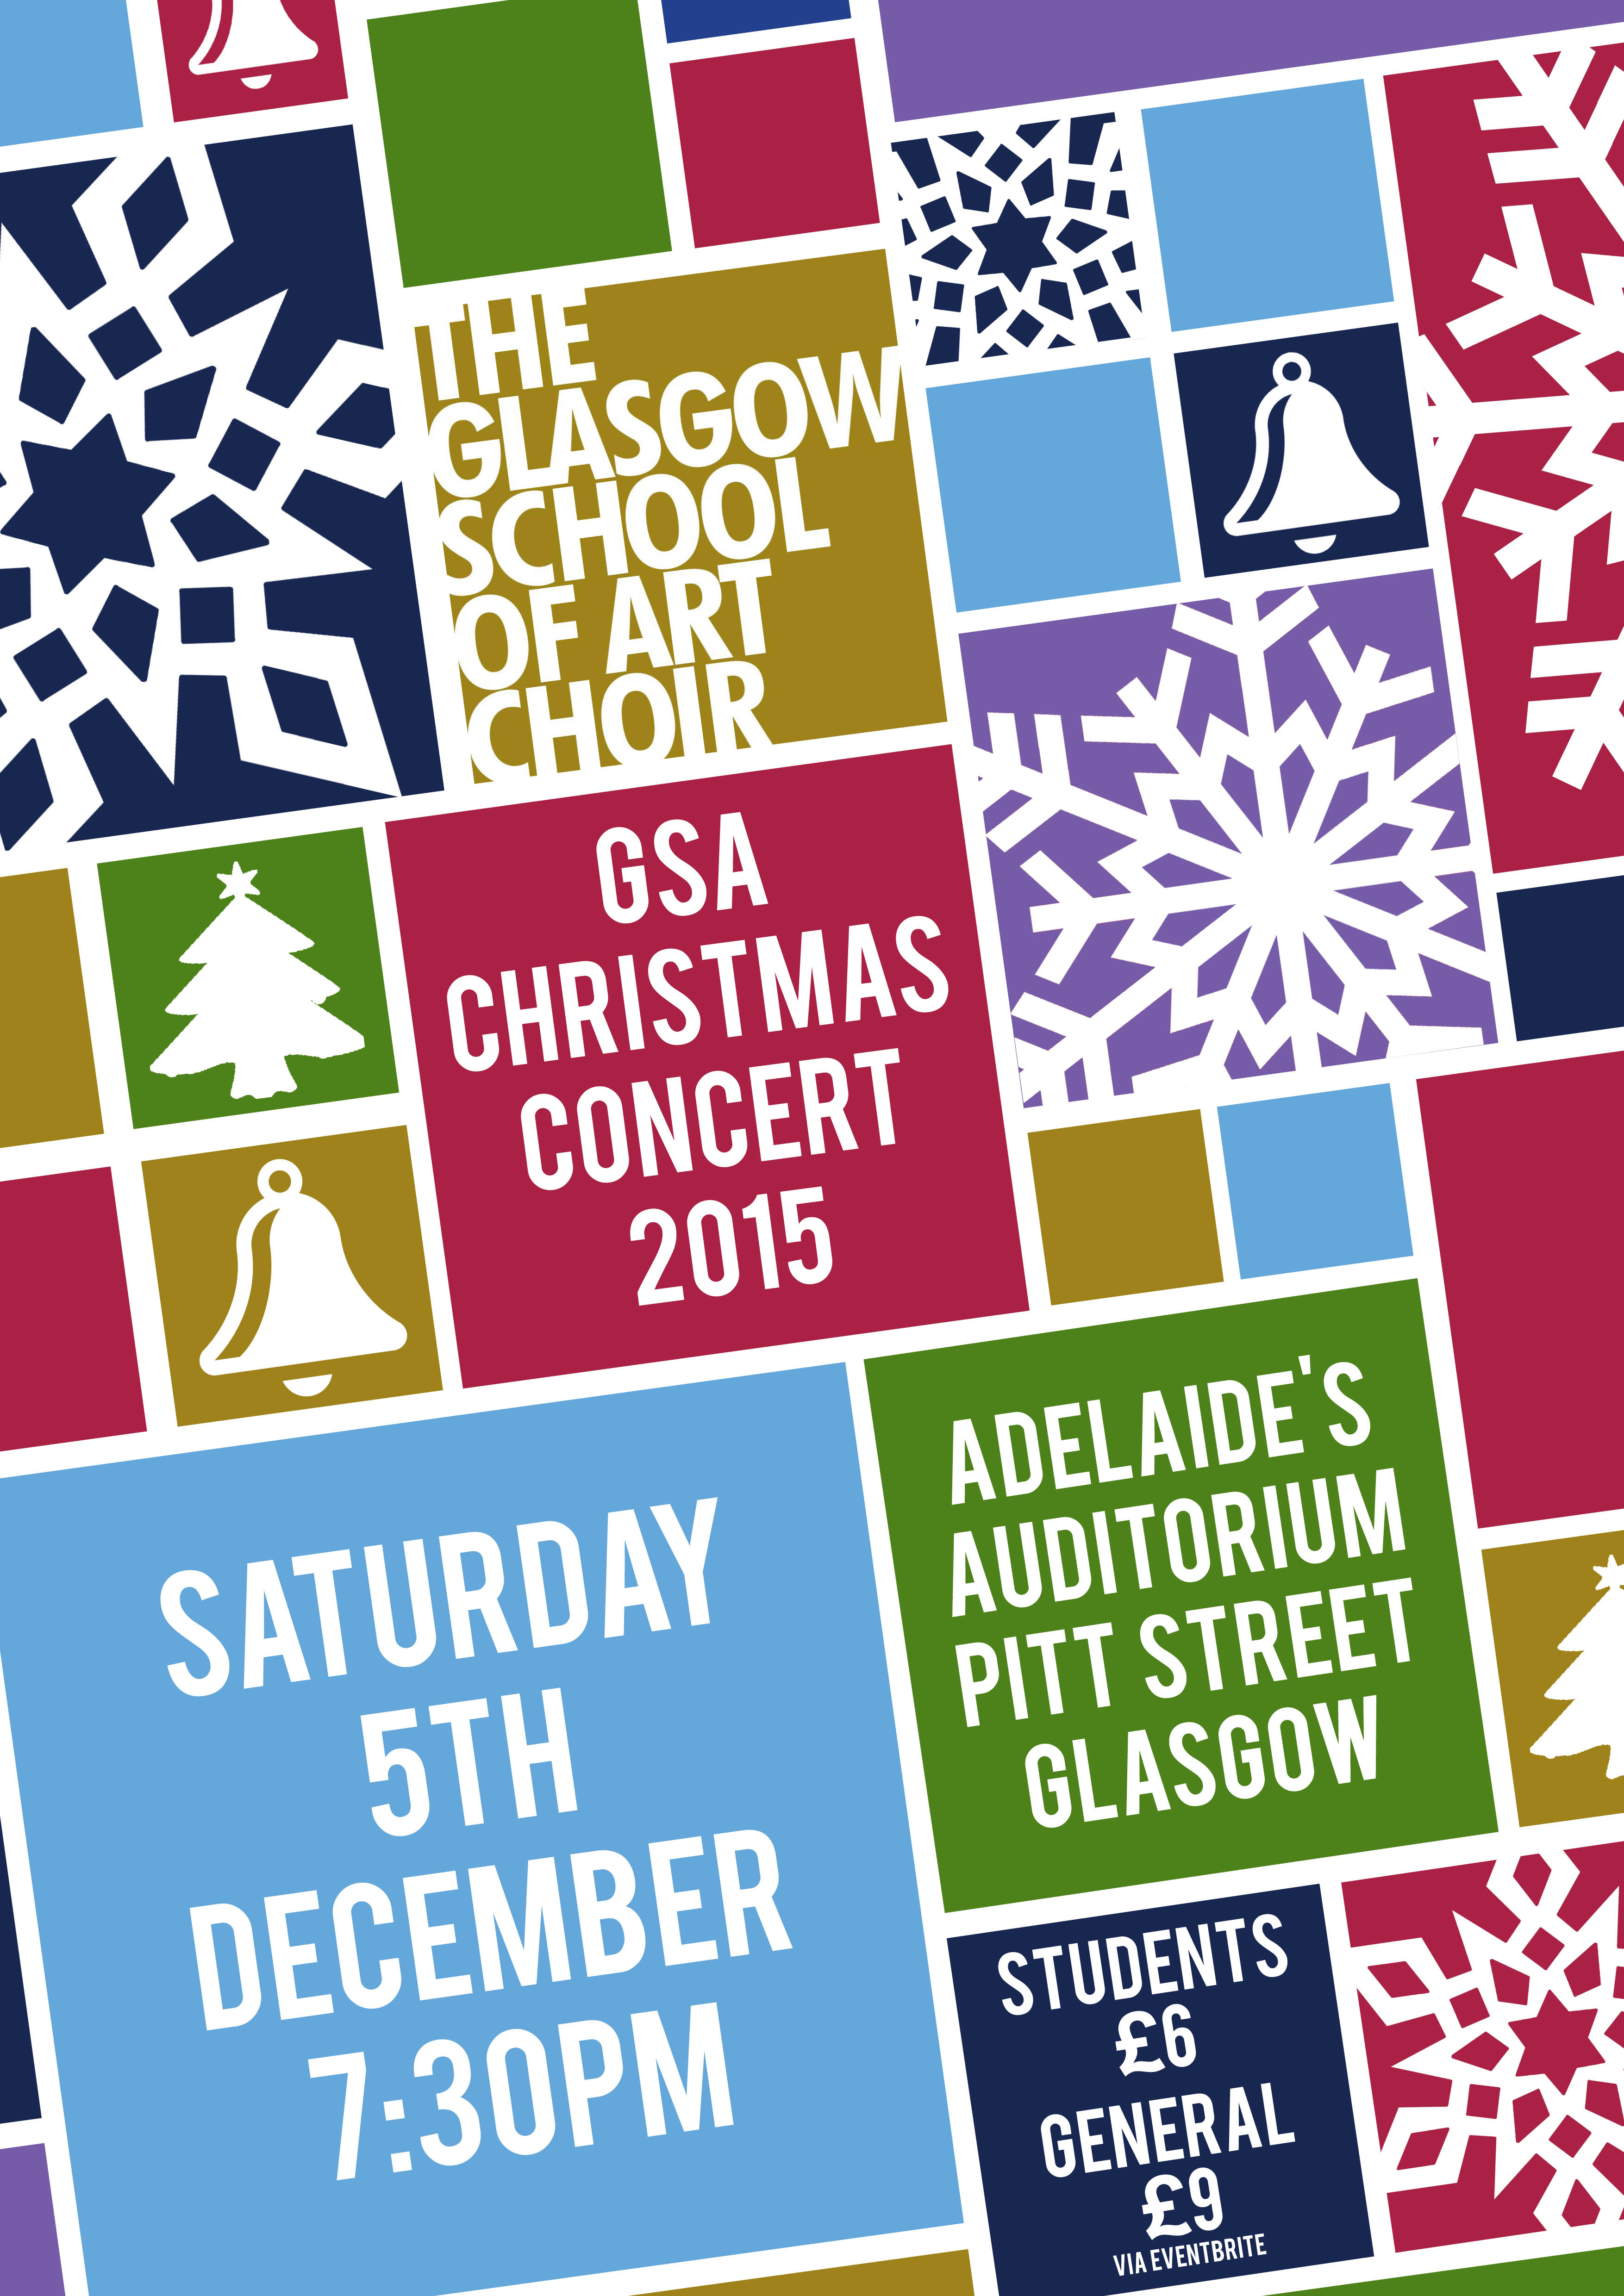 GSA Christmas Concert 2015 poster designed by Gaelen McCartney